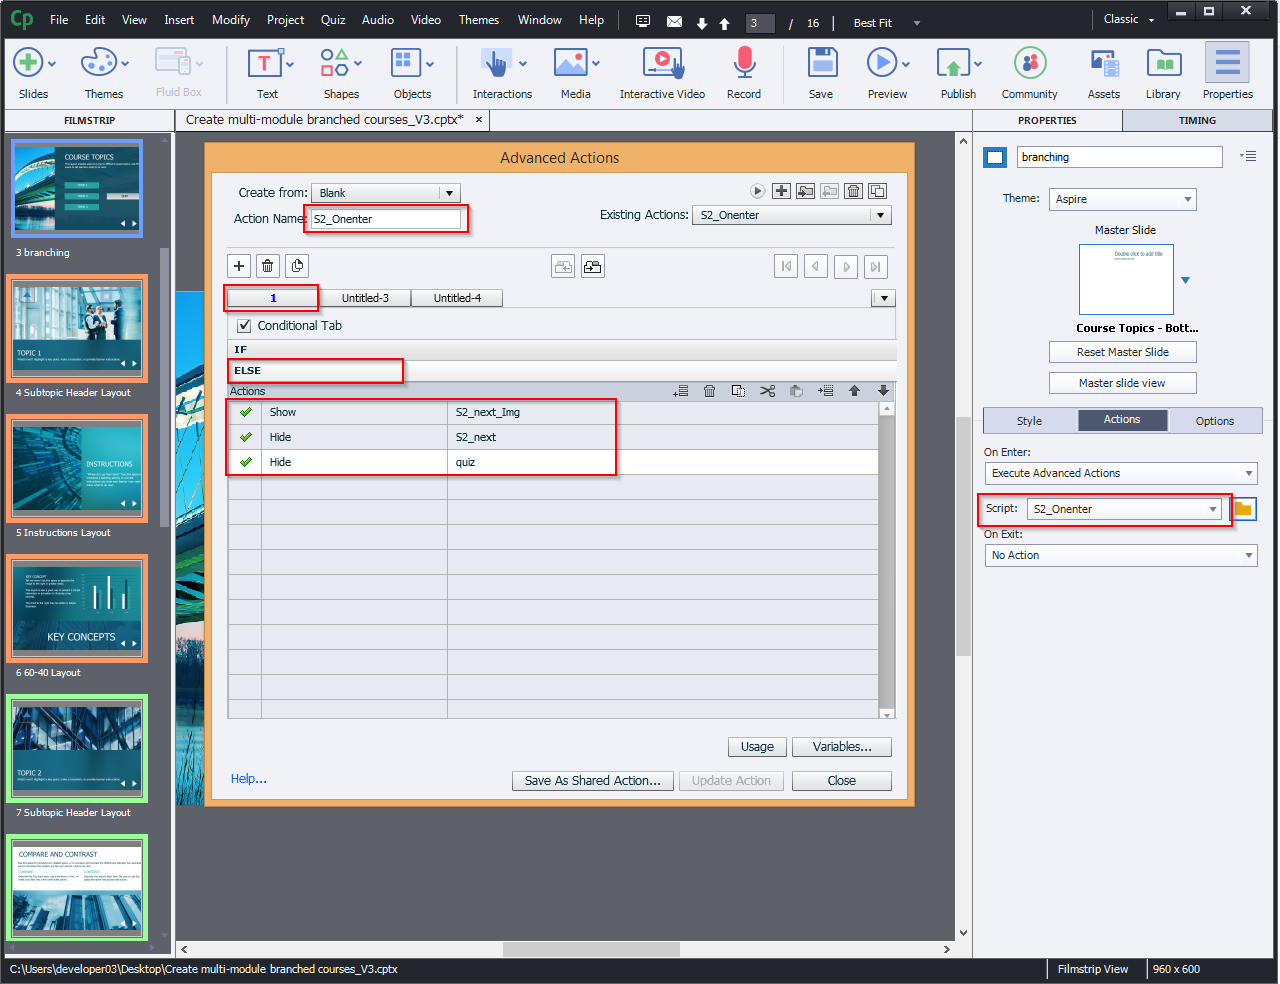 Create multi-module branched courses 11.1